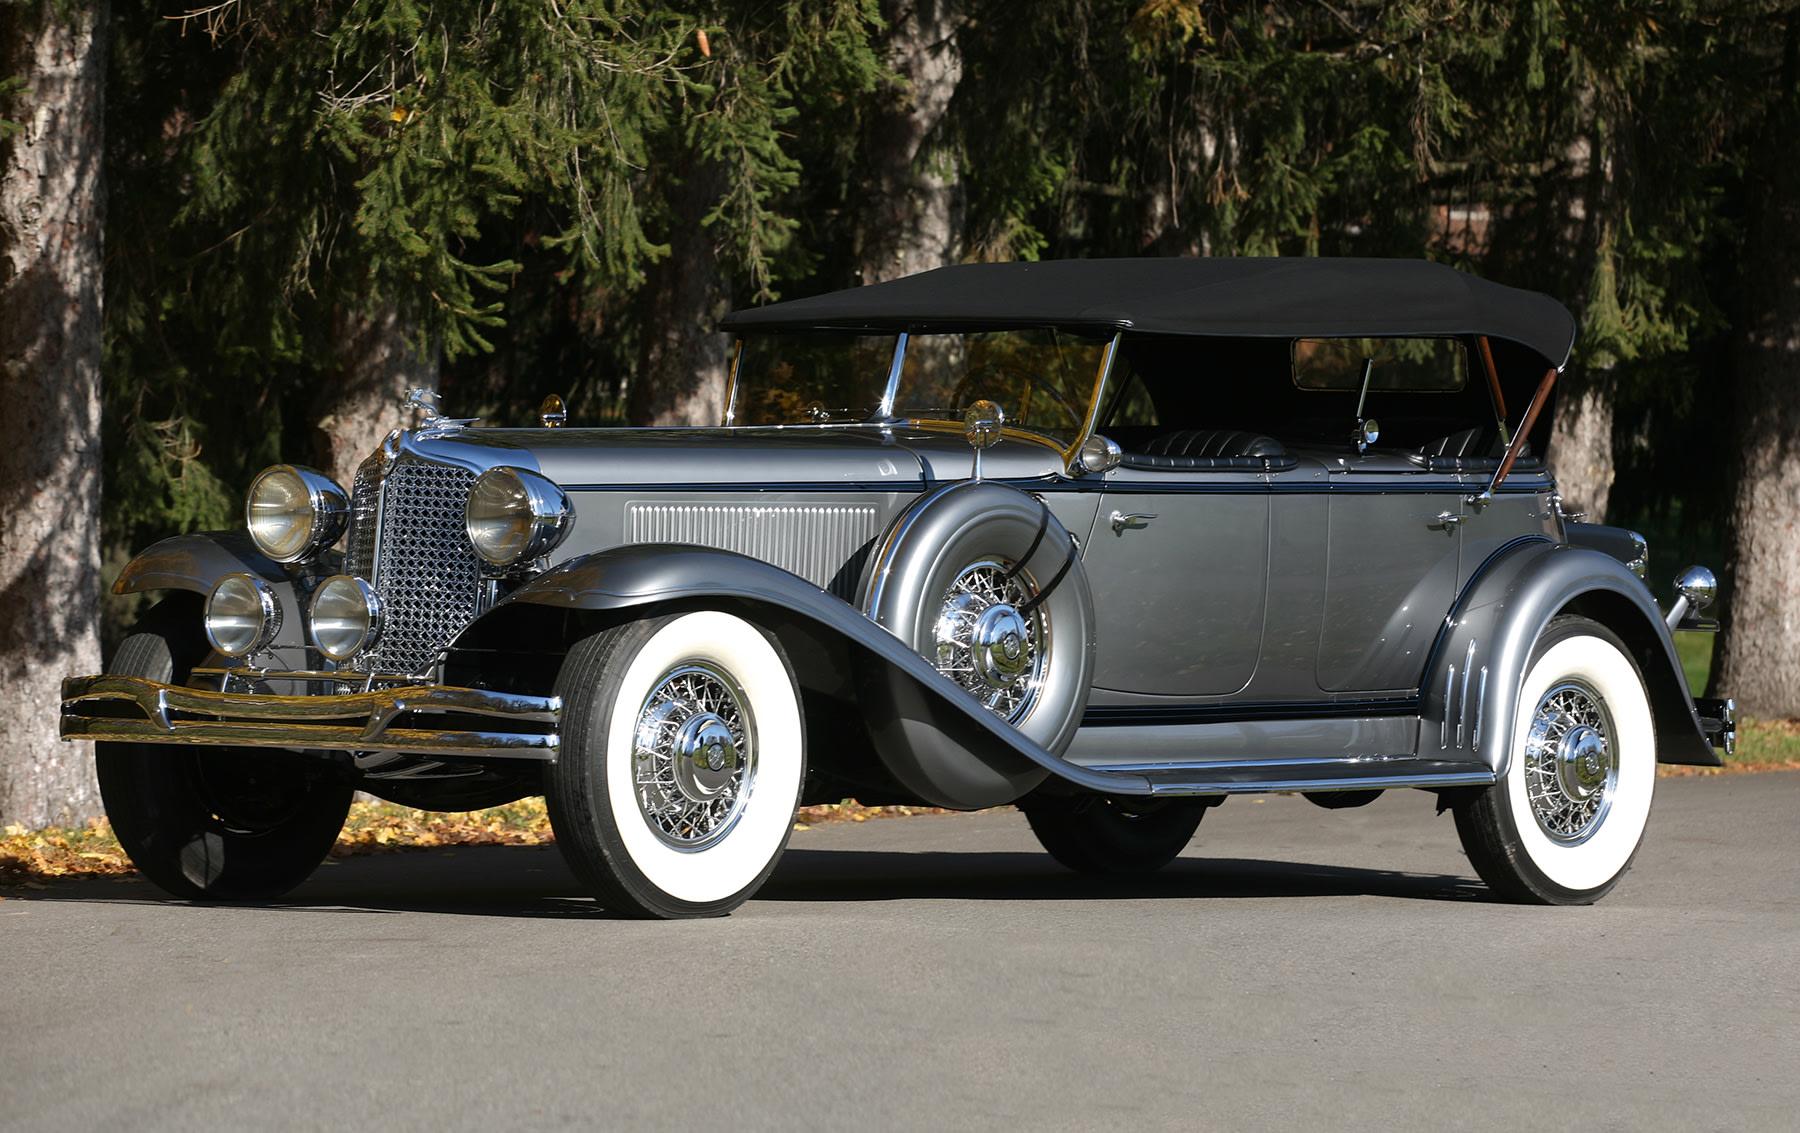 1931 Chrysler CG Imperial Dual Cowl Phaeton